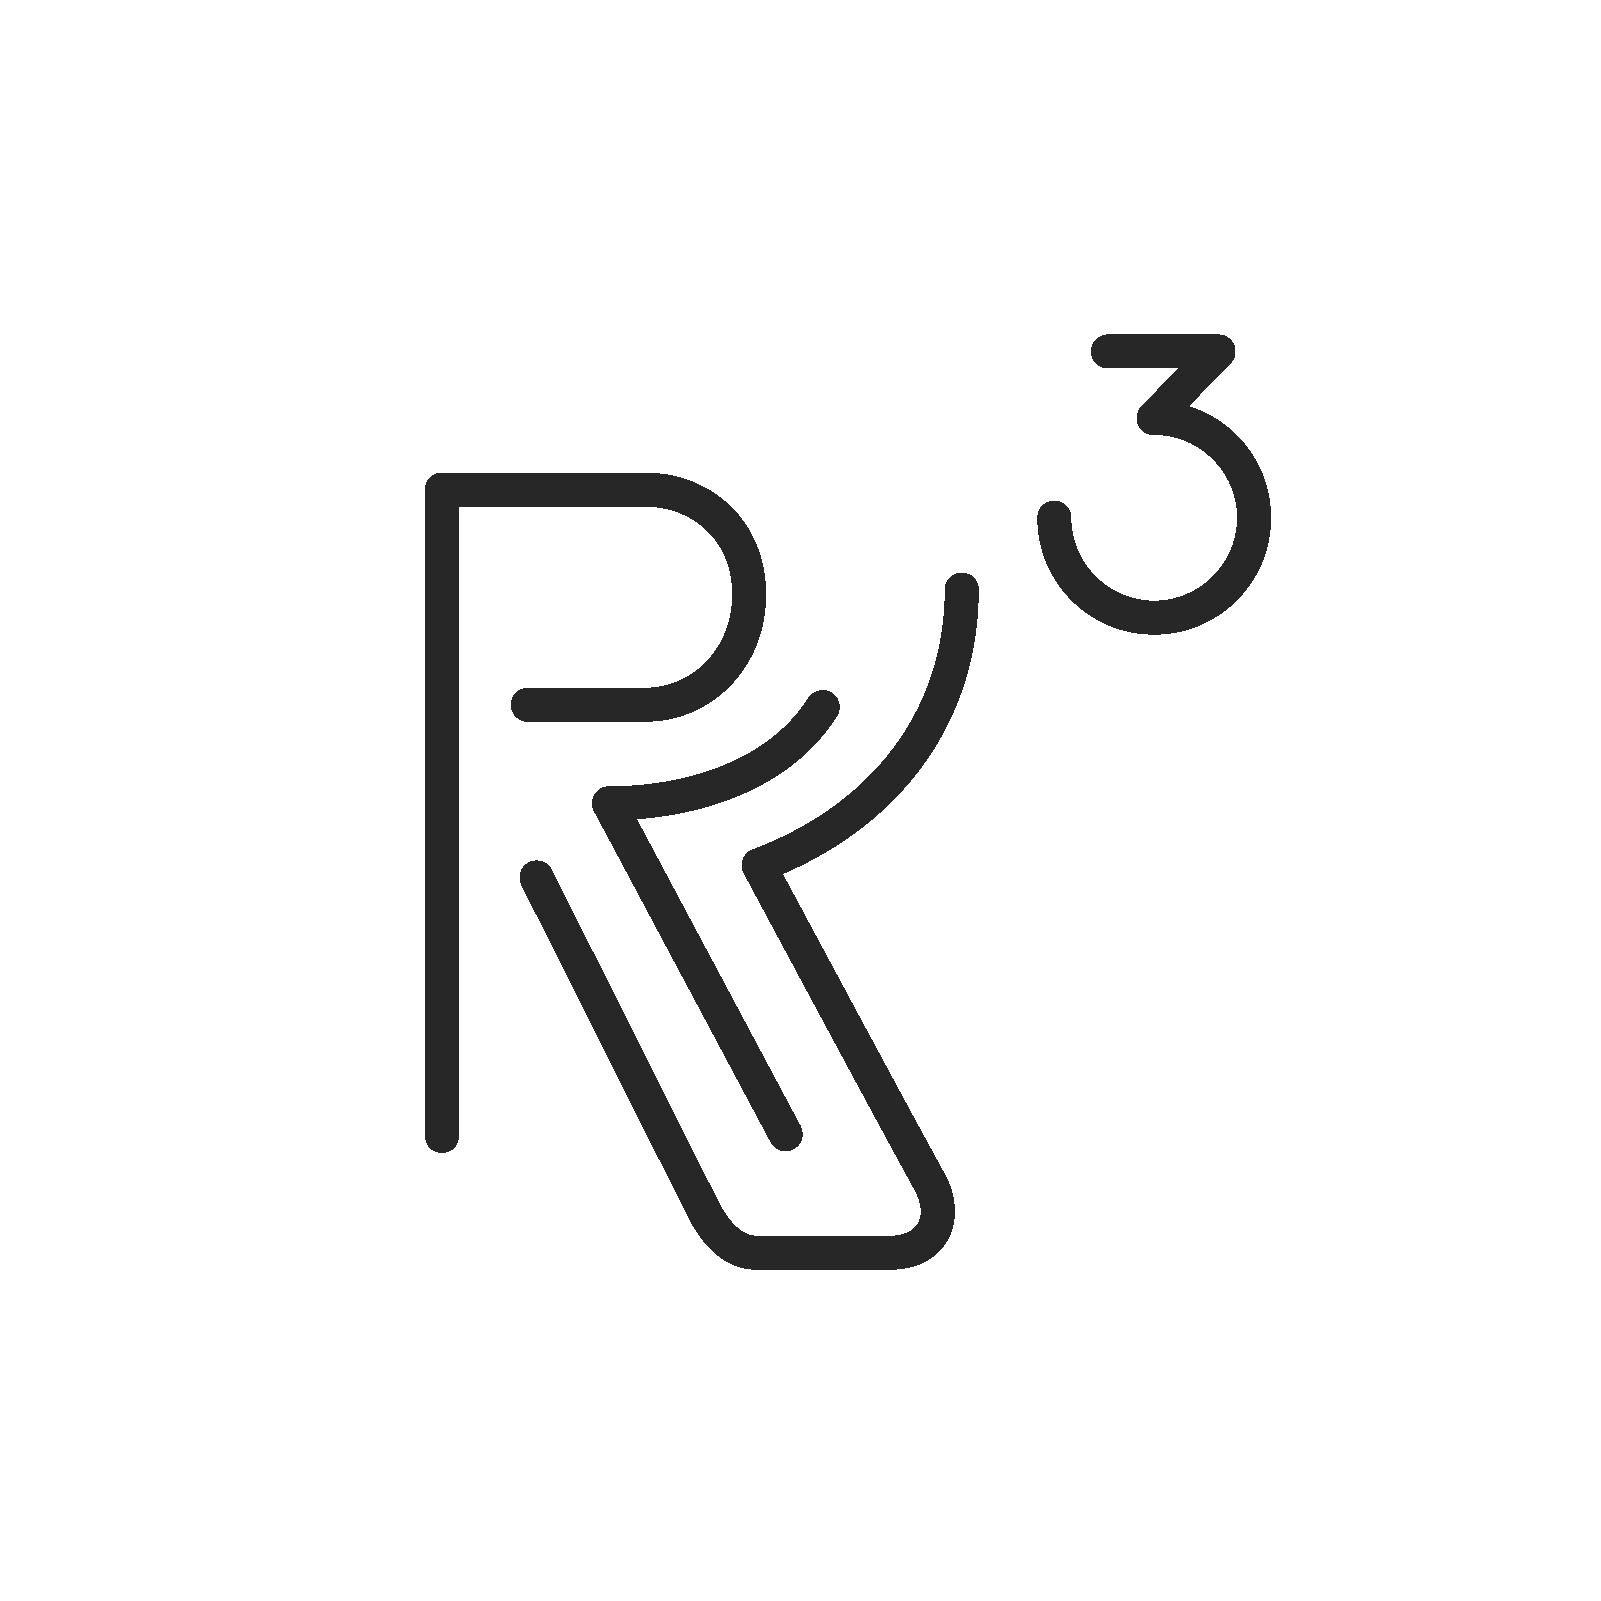 R3_logo_icon.png